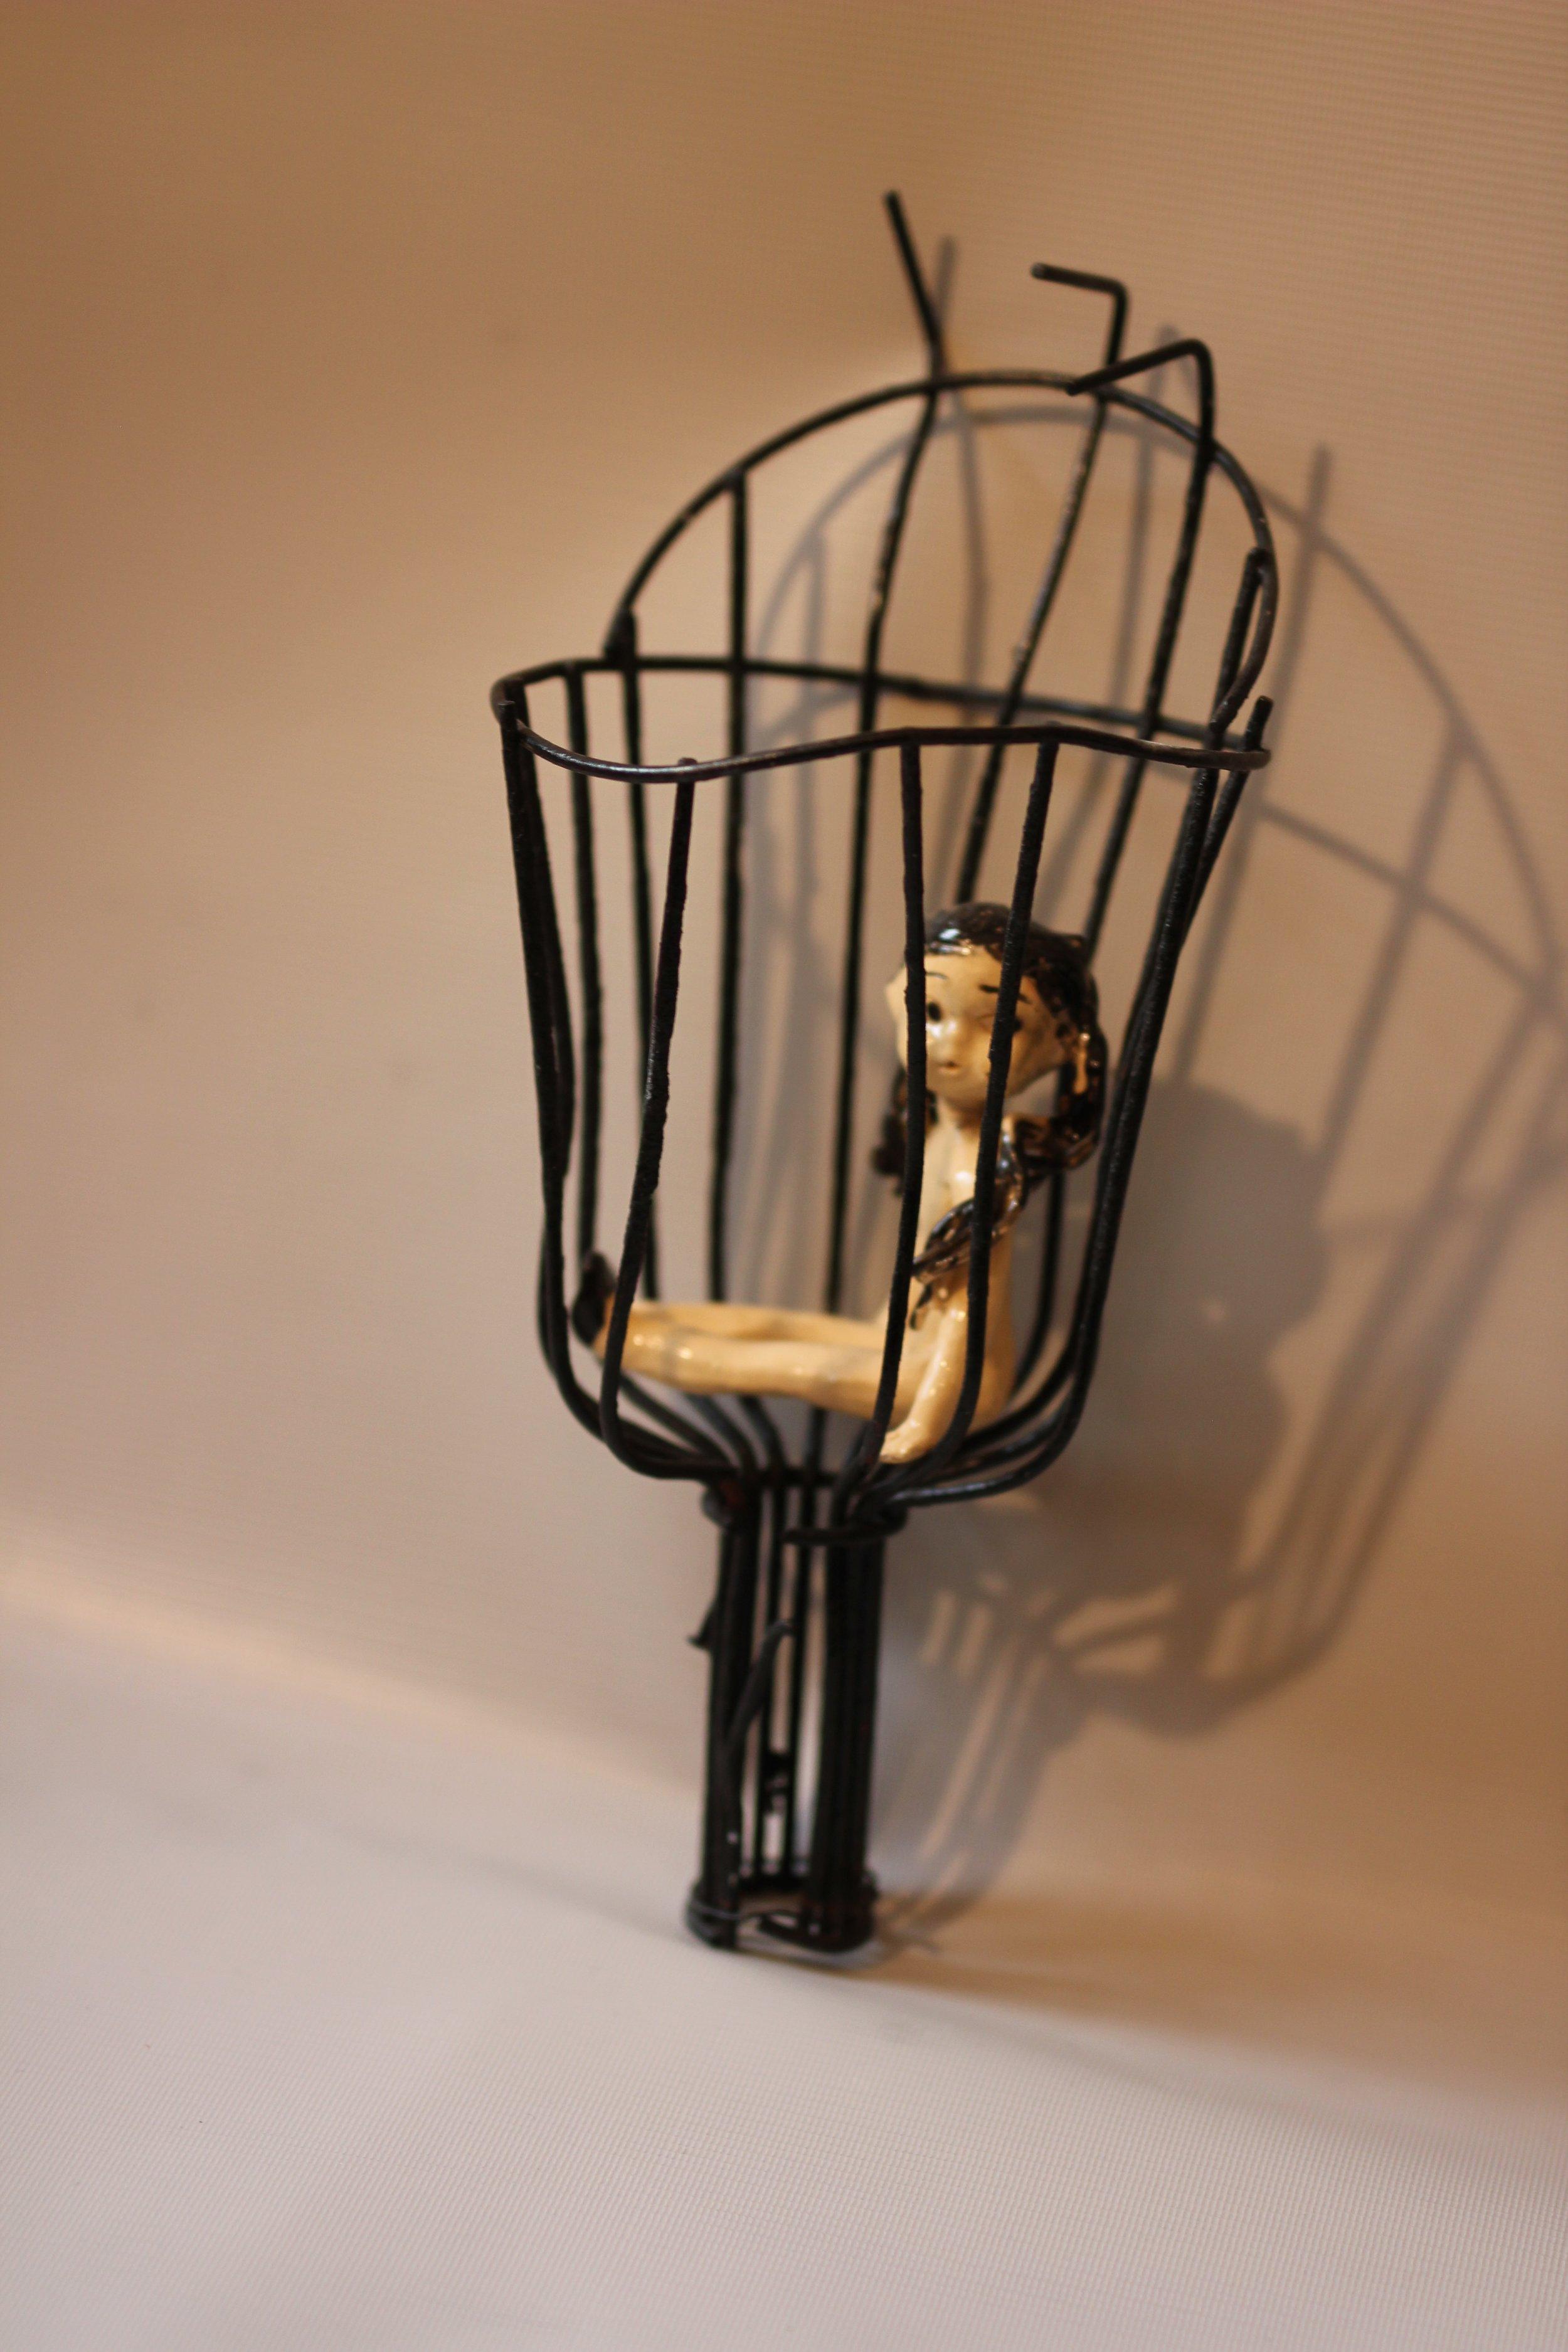 Image 4 - Caged - C Radclyffe .jpg